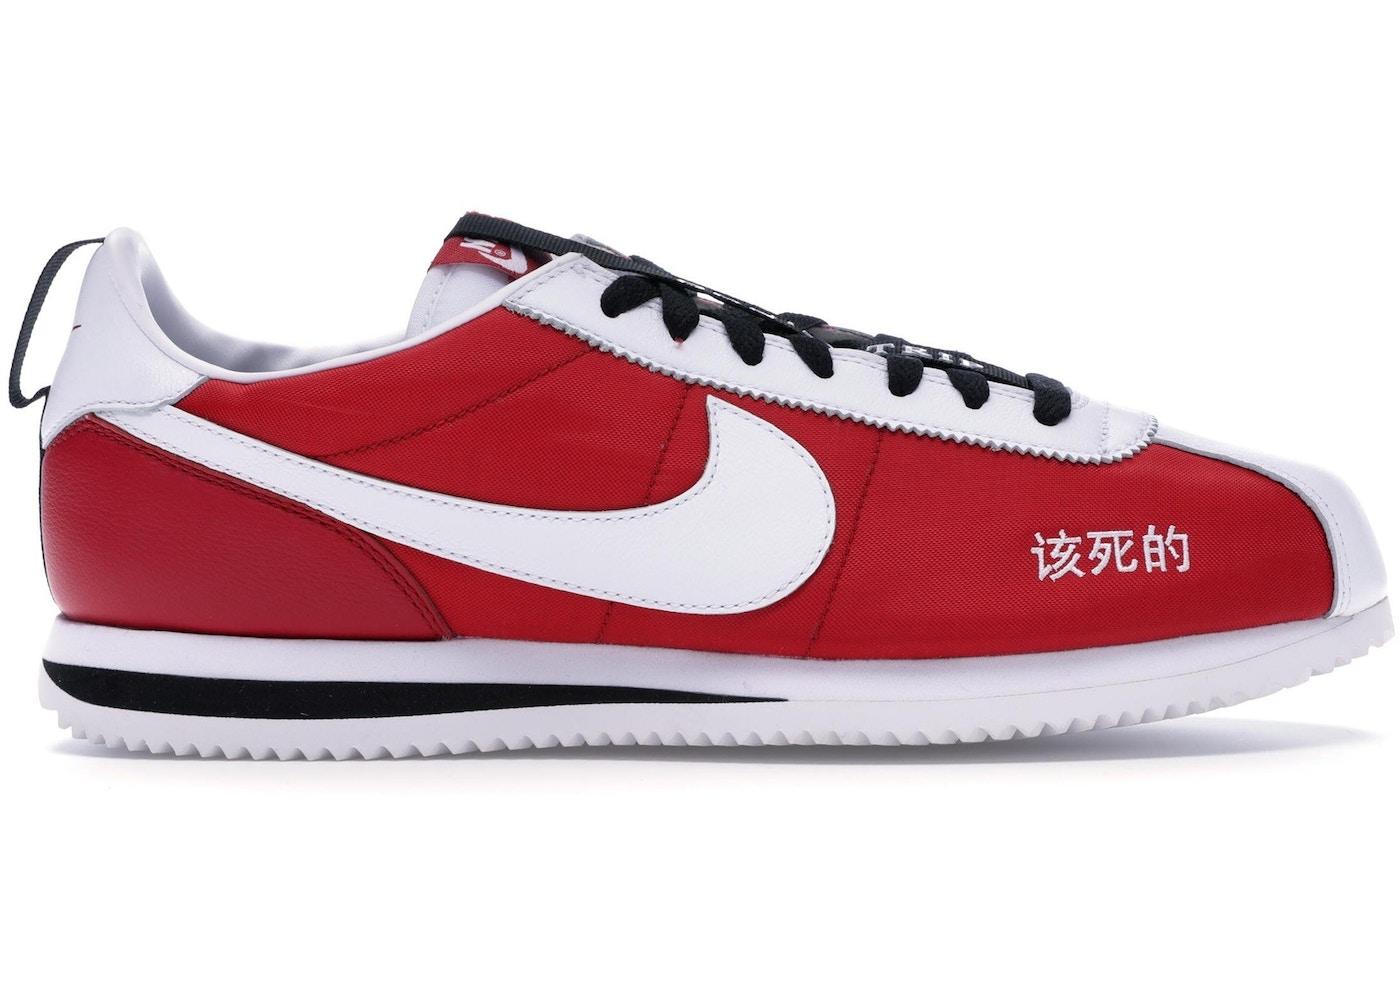 on sale 19b81 4d7e1 Nike Cortez Kenny 2 Kendrick Lamar Kung Fu Kenny